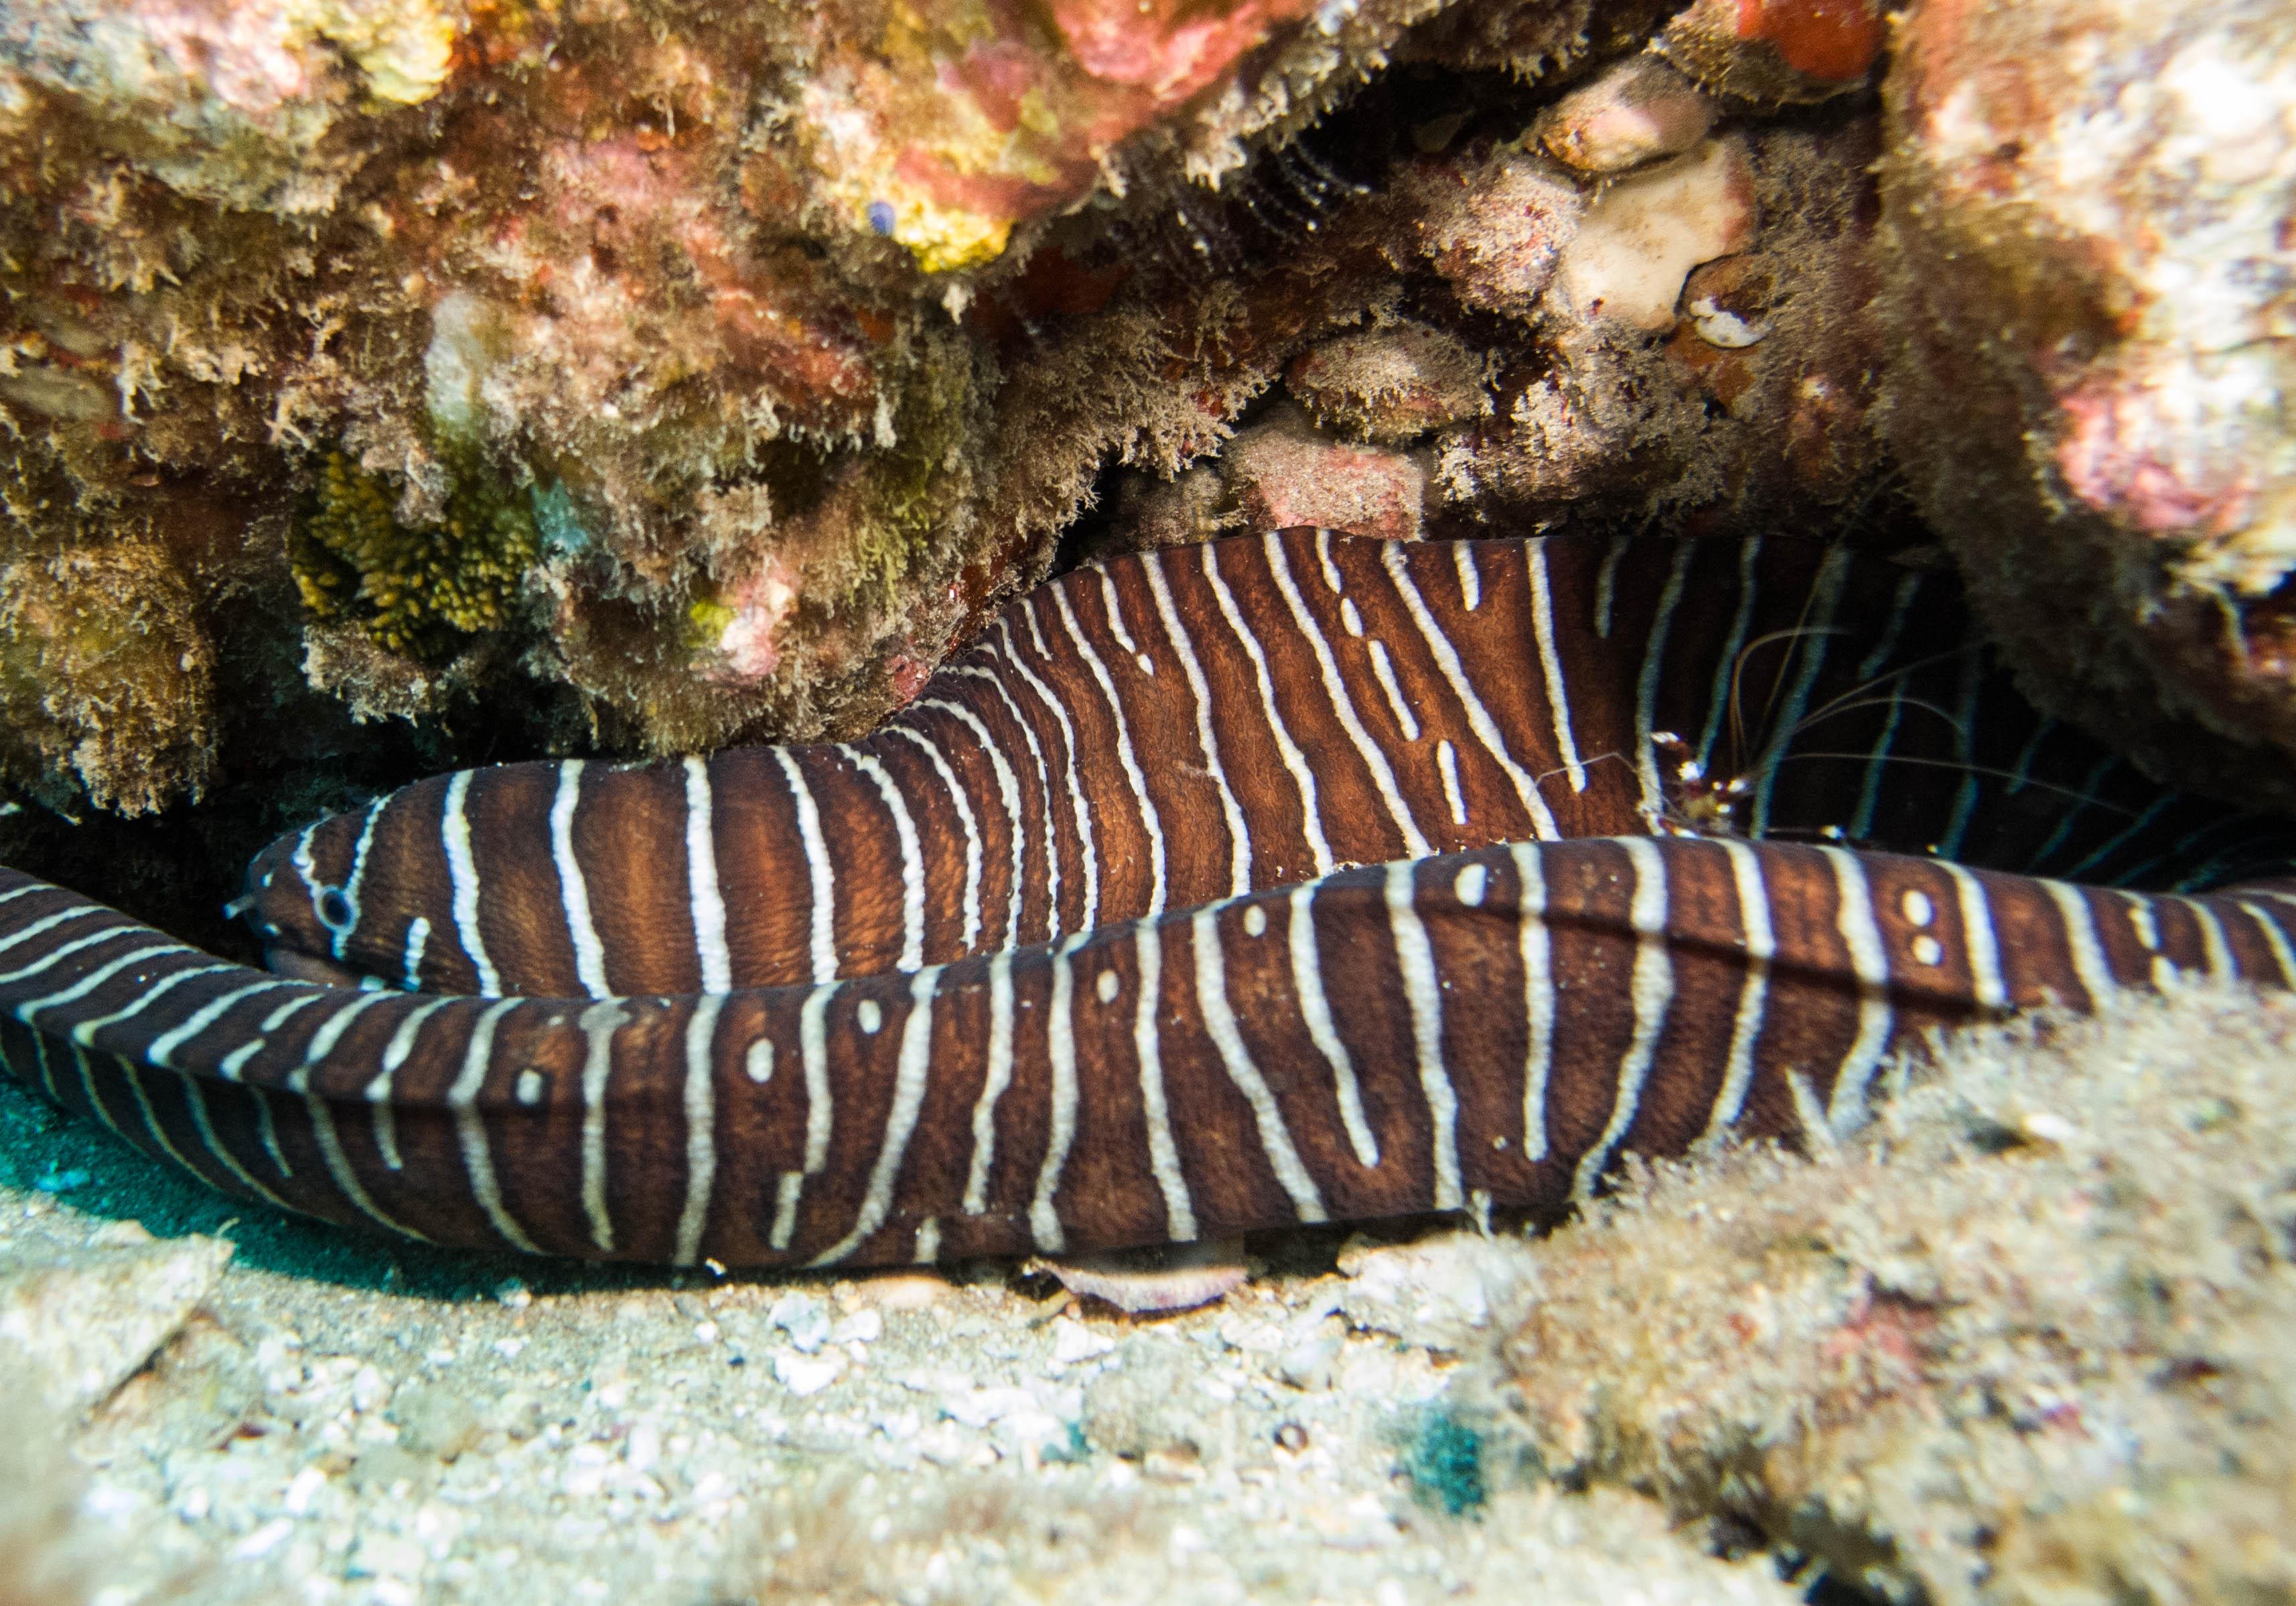 Zebra Moray Eel